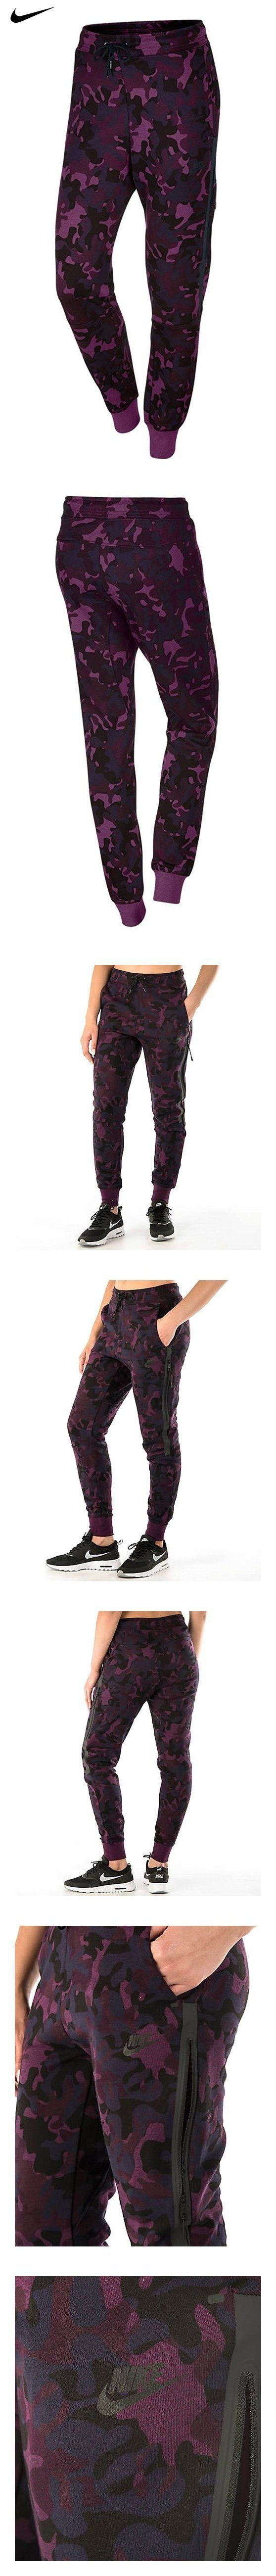 Nike Women's Tech Fleece Printed Cuffed Pants 695344 (Large, Purple Camo)